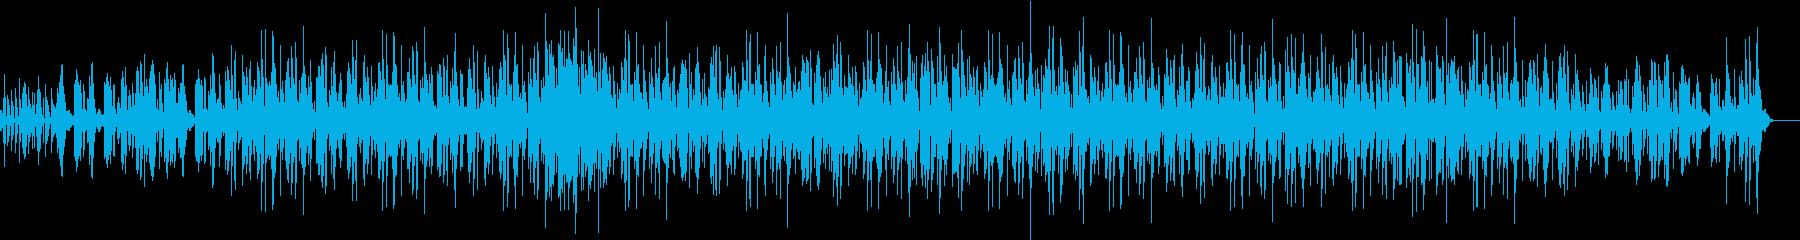 WBassとEGtとのFunkセッションの再生済みの波形